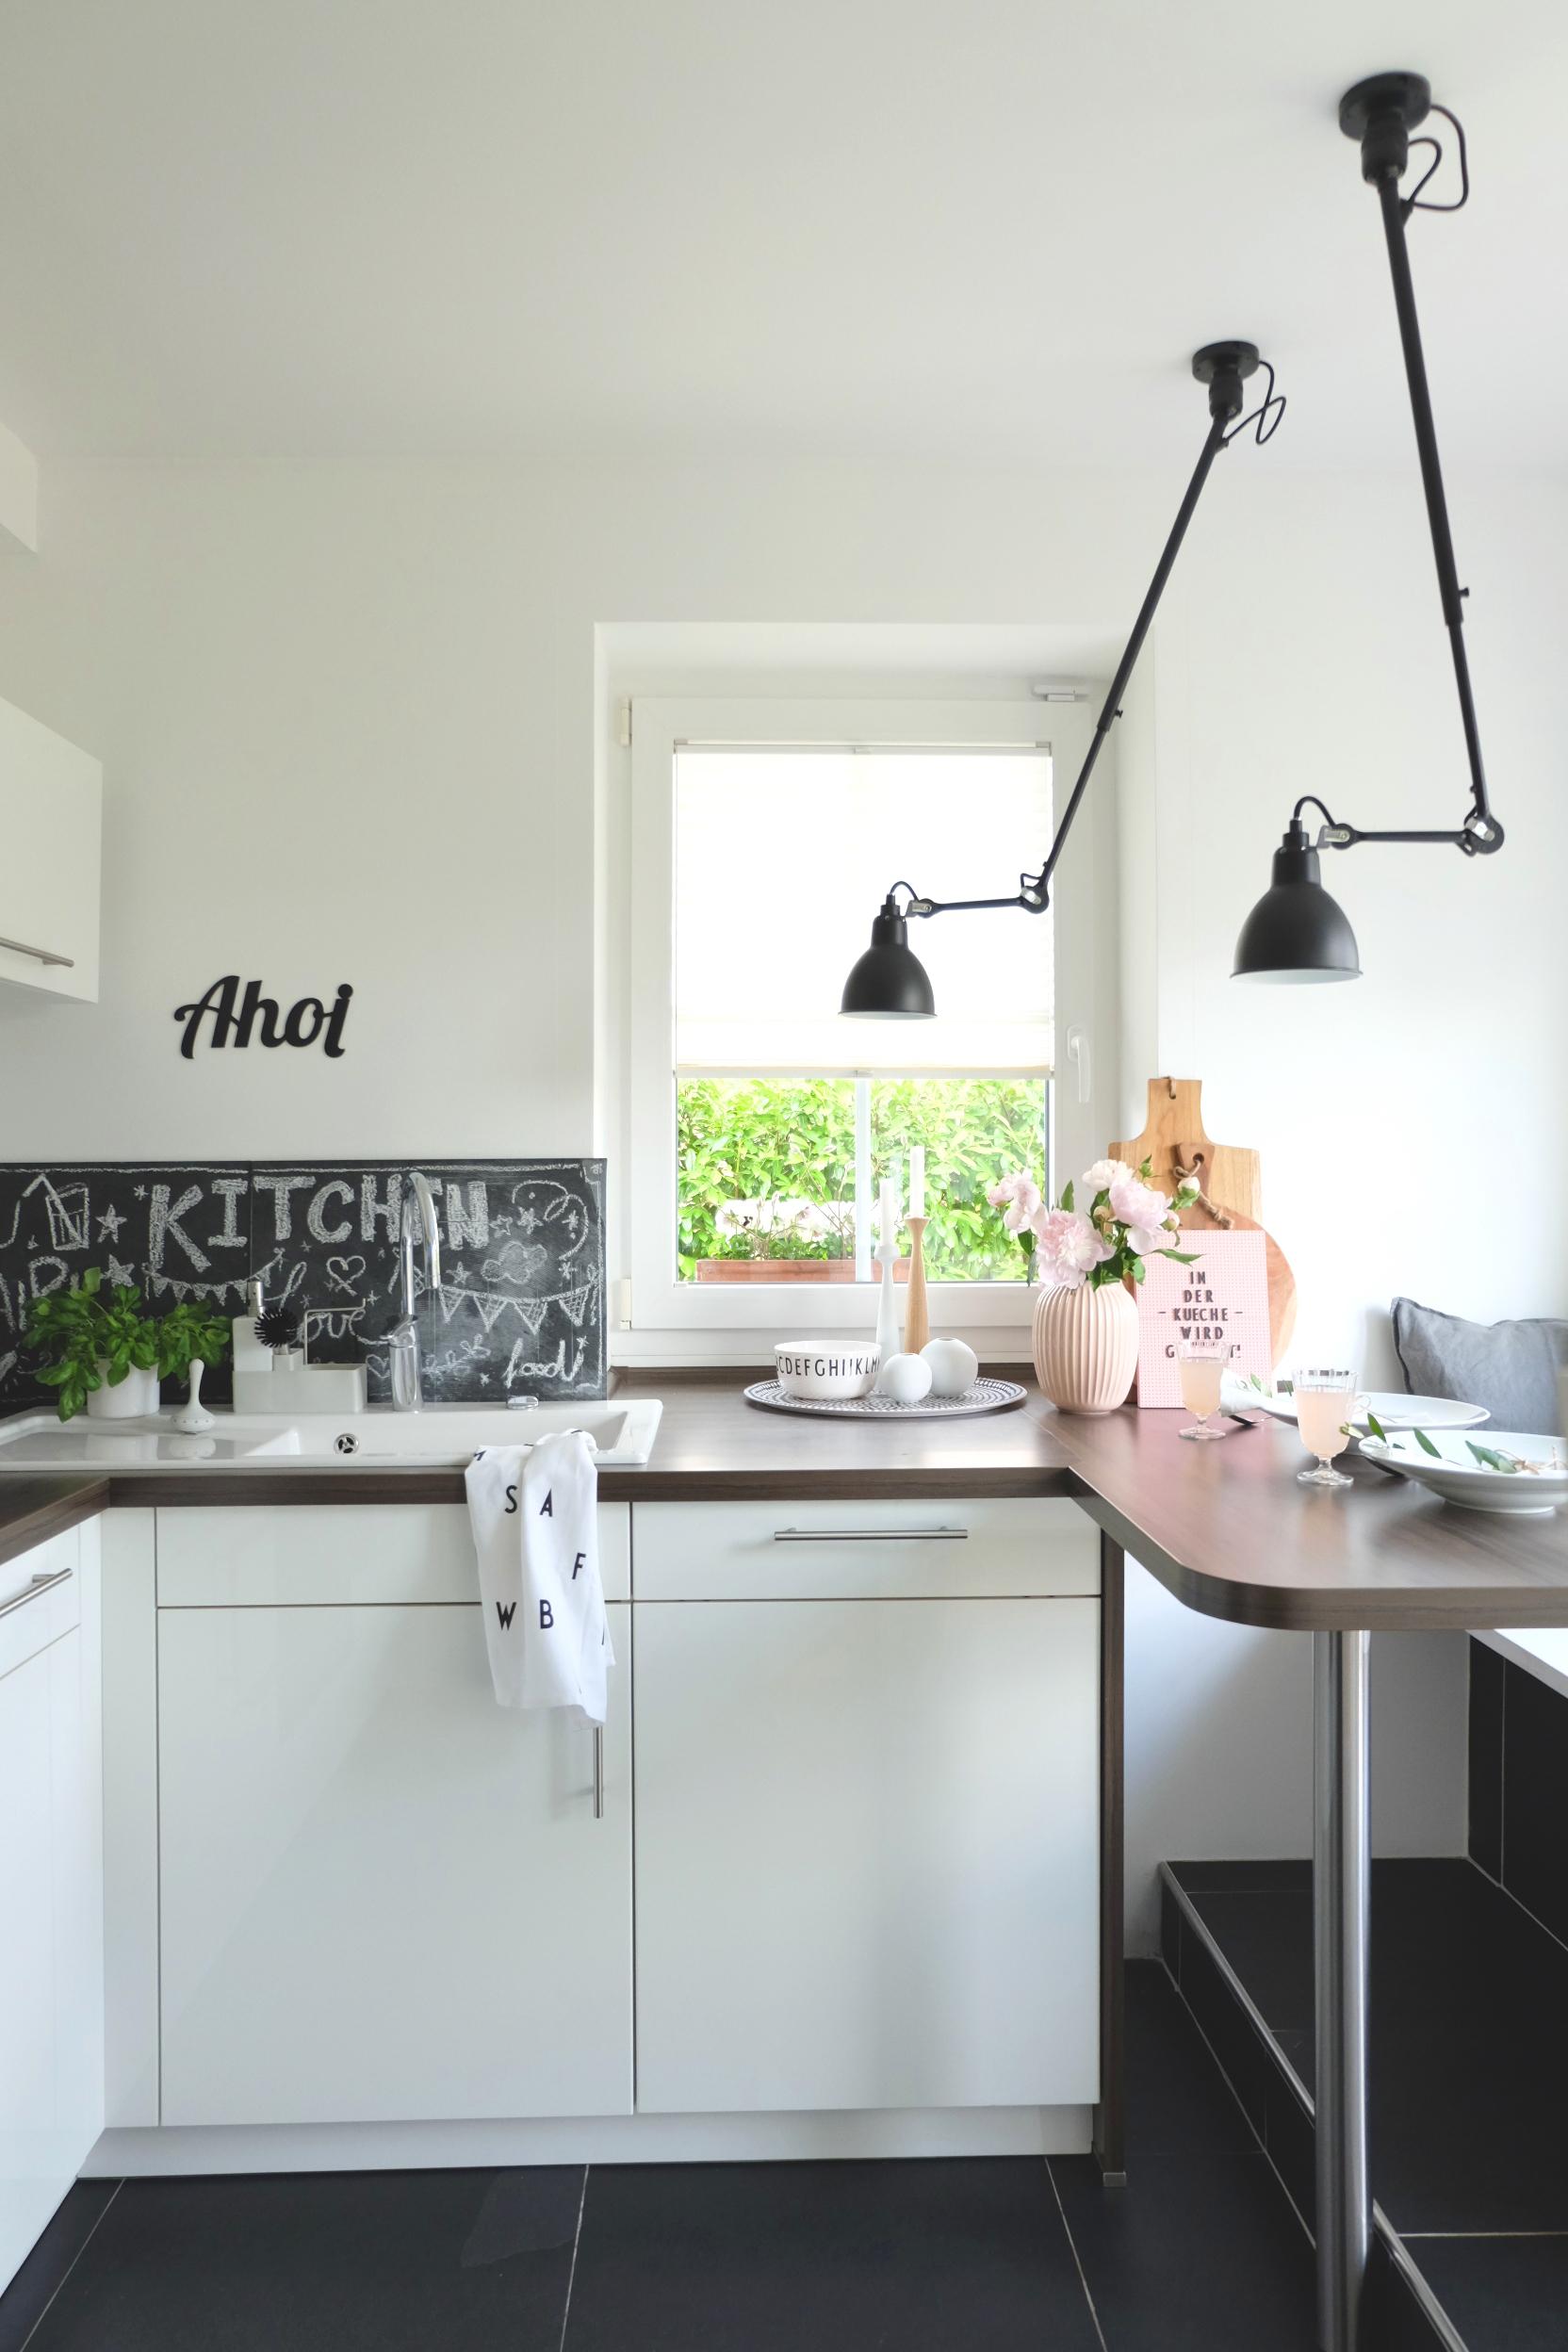 light11 DCW Lampe Küche 21 – so.leben.wir